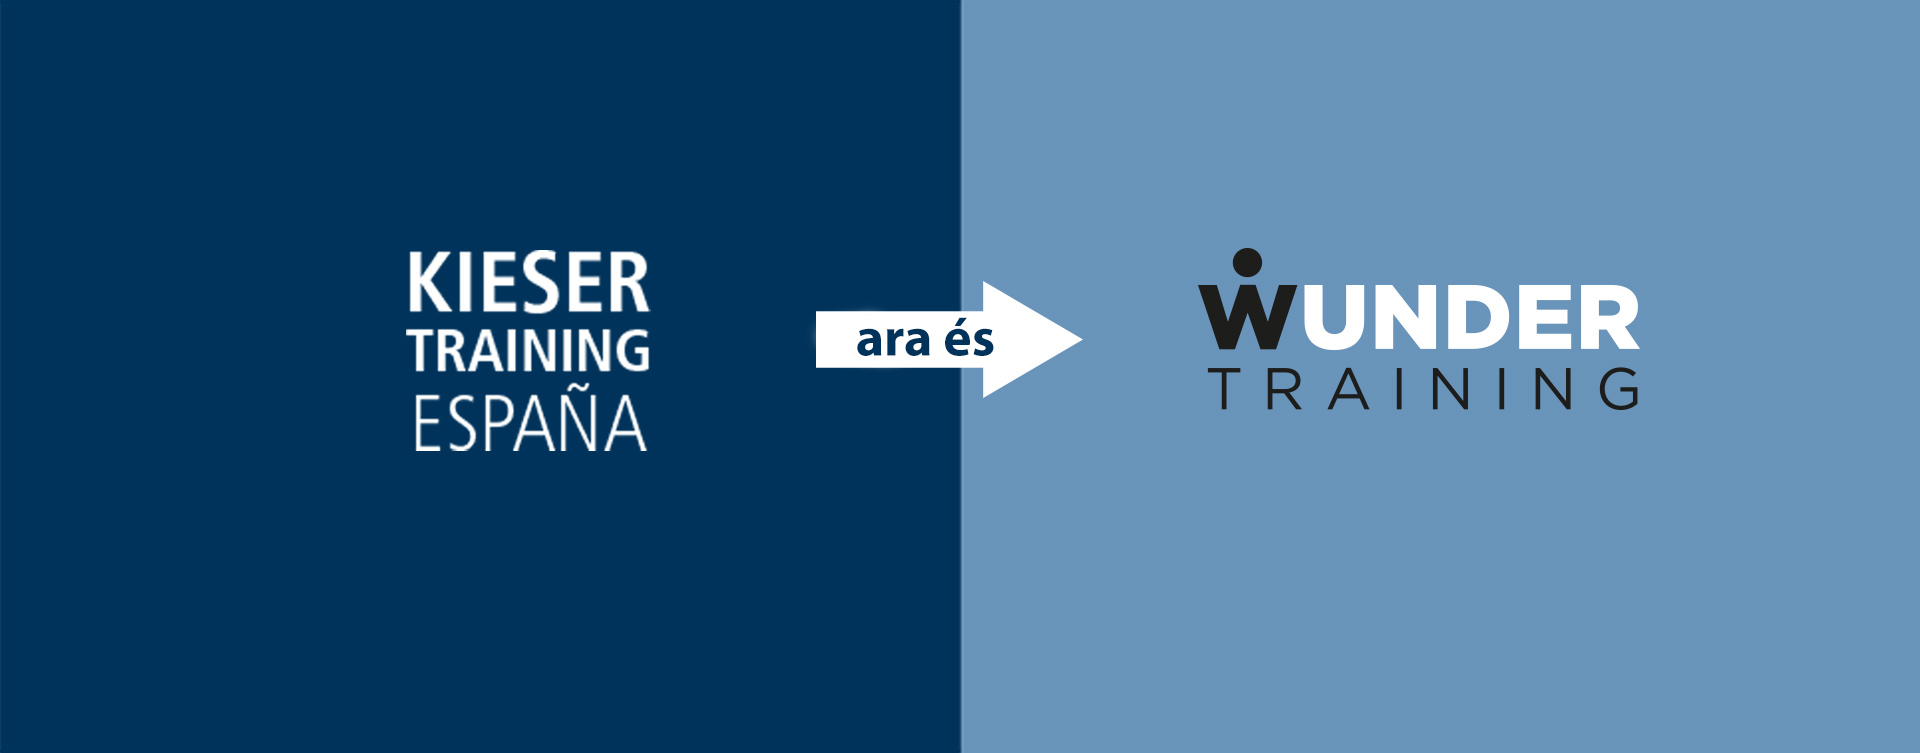 kieser-training-ara-es-wunder-training